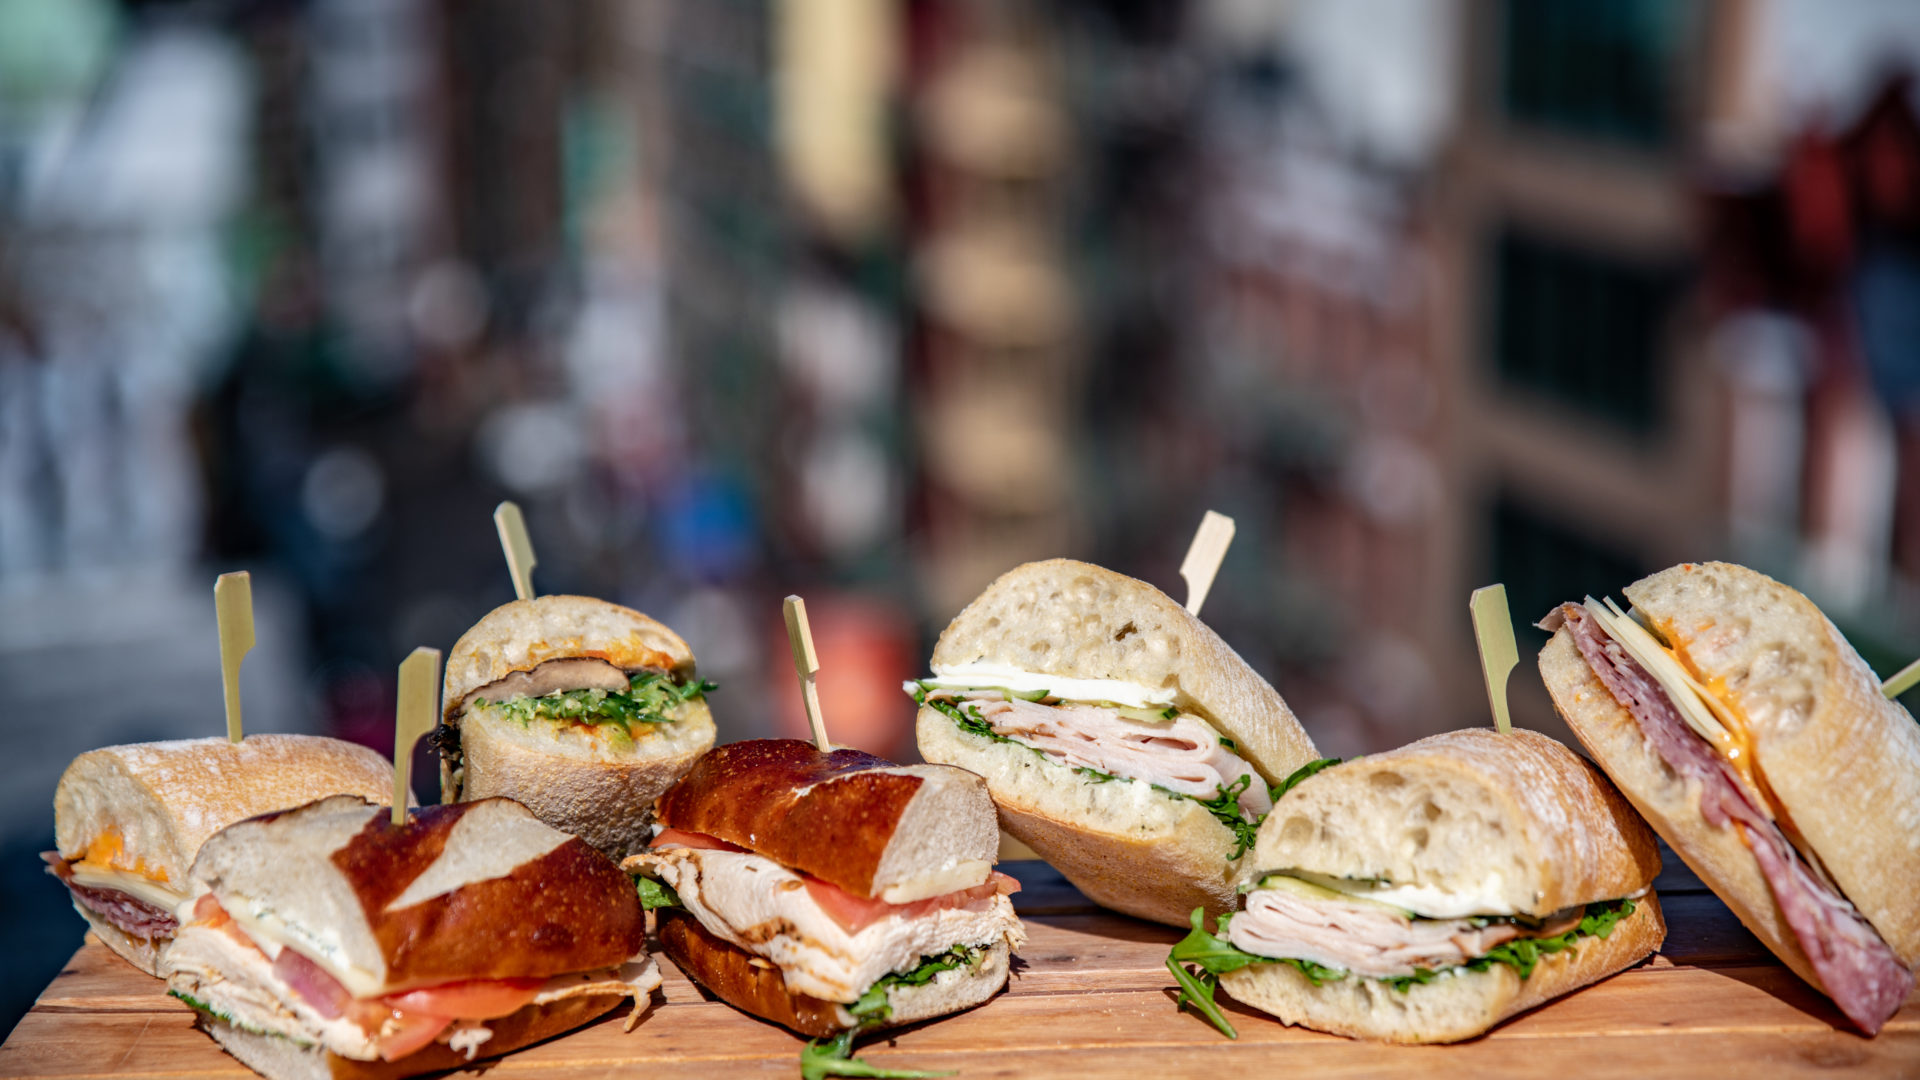 Large New York deli sandwiches